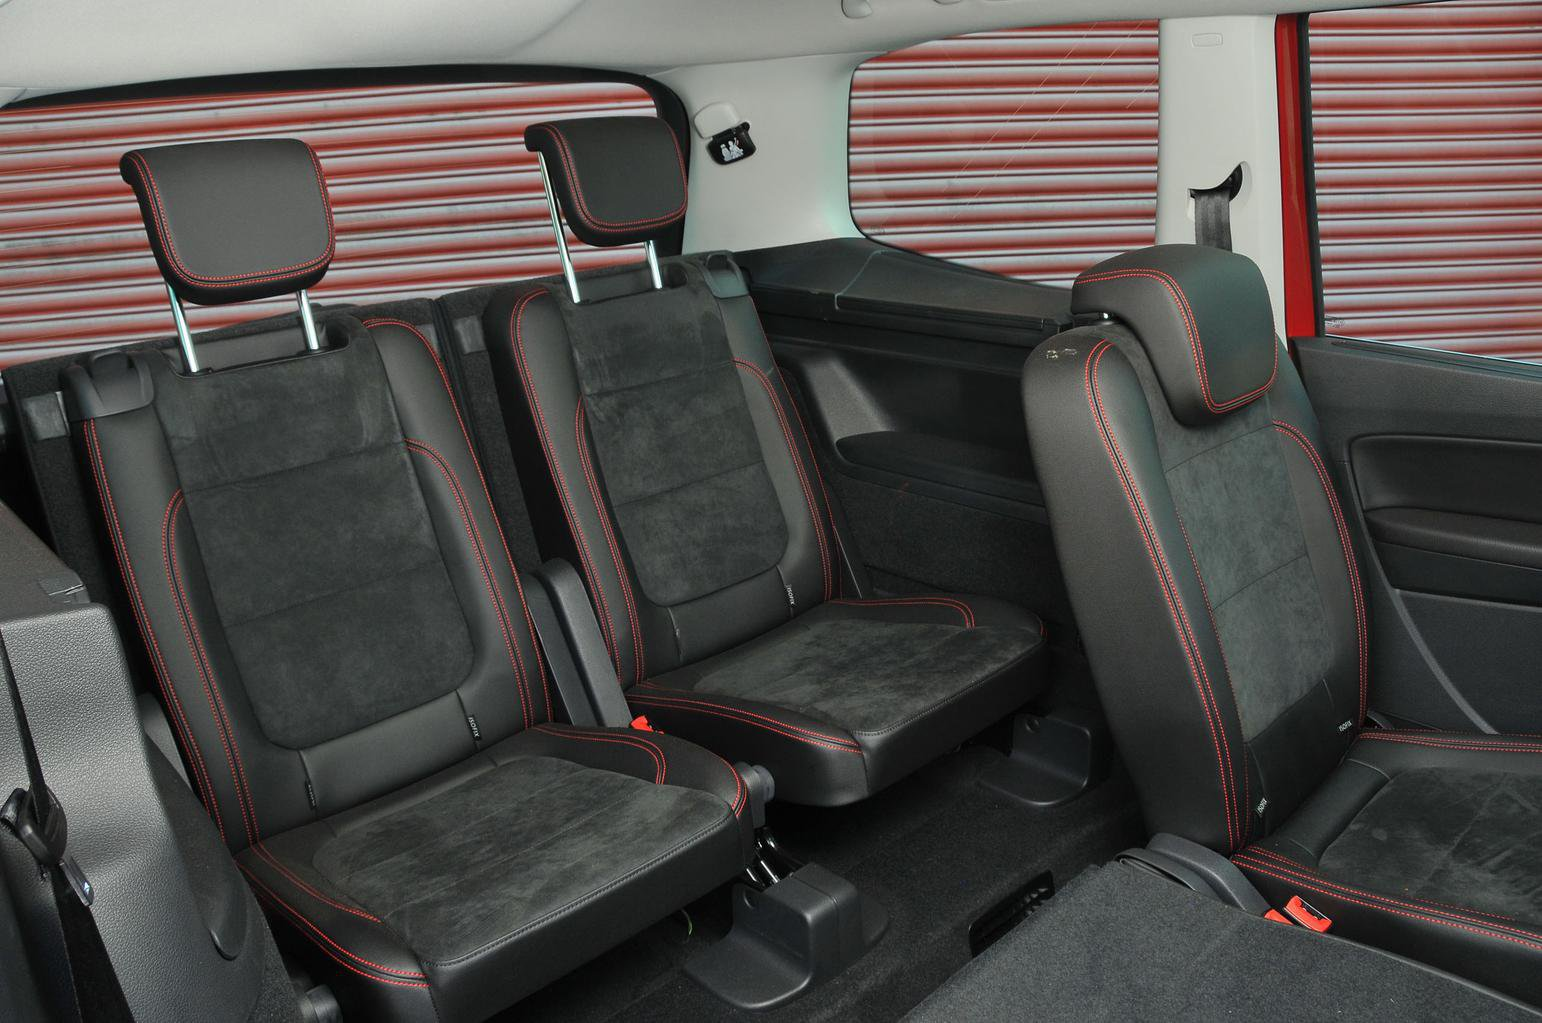 2016 Seat Alhambra 2.0 TDI FR Line review